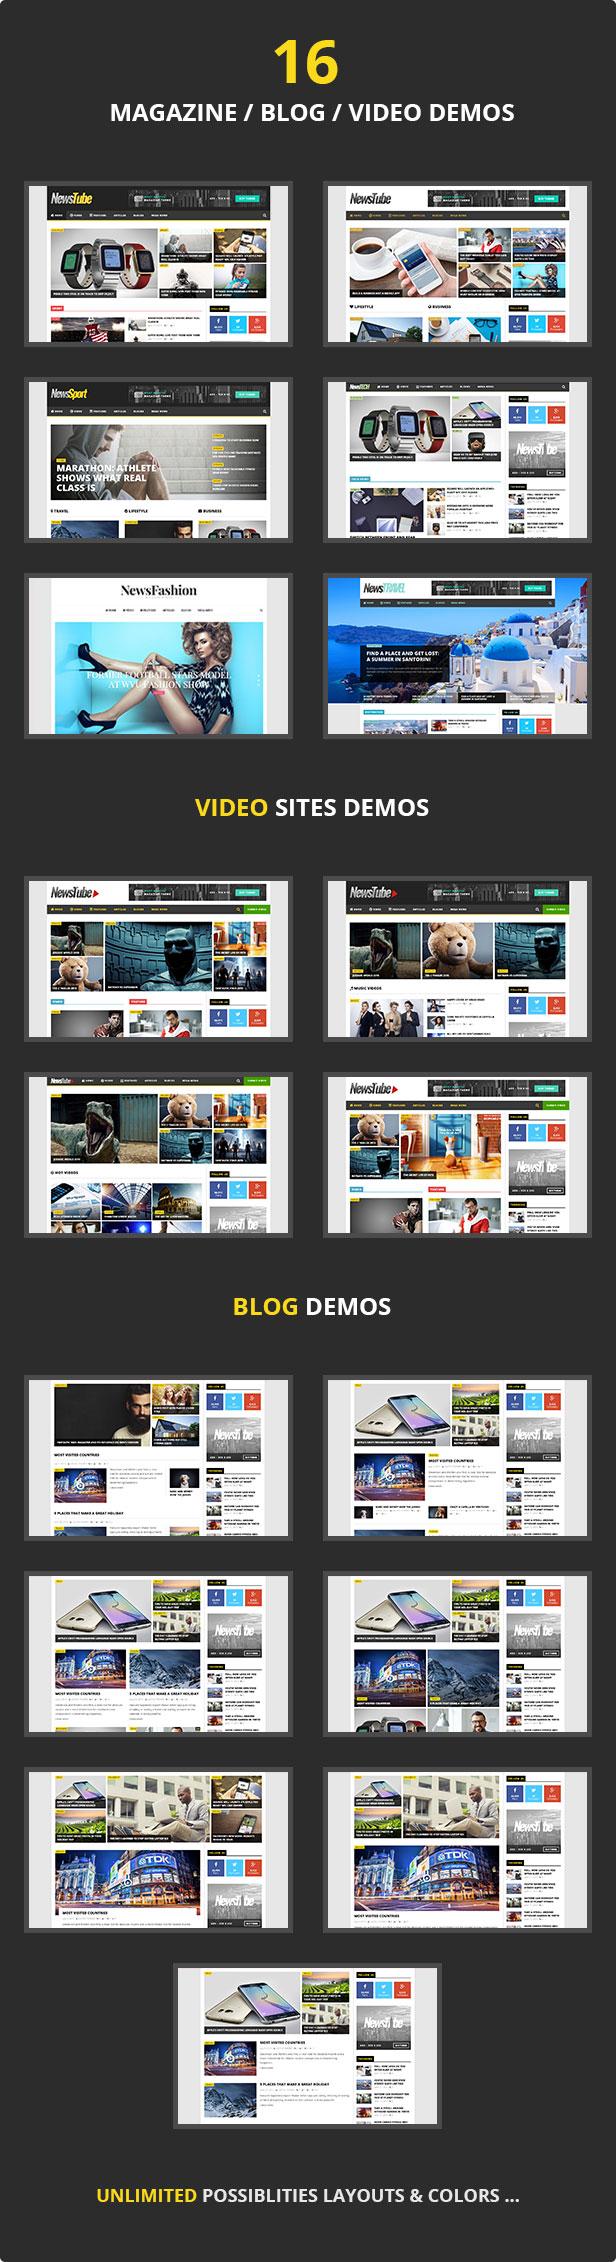 newstube top 07 - NewsTube - Magazine Blog & Video